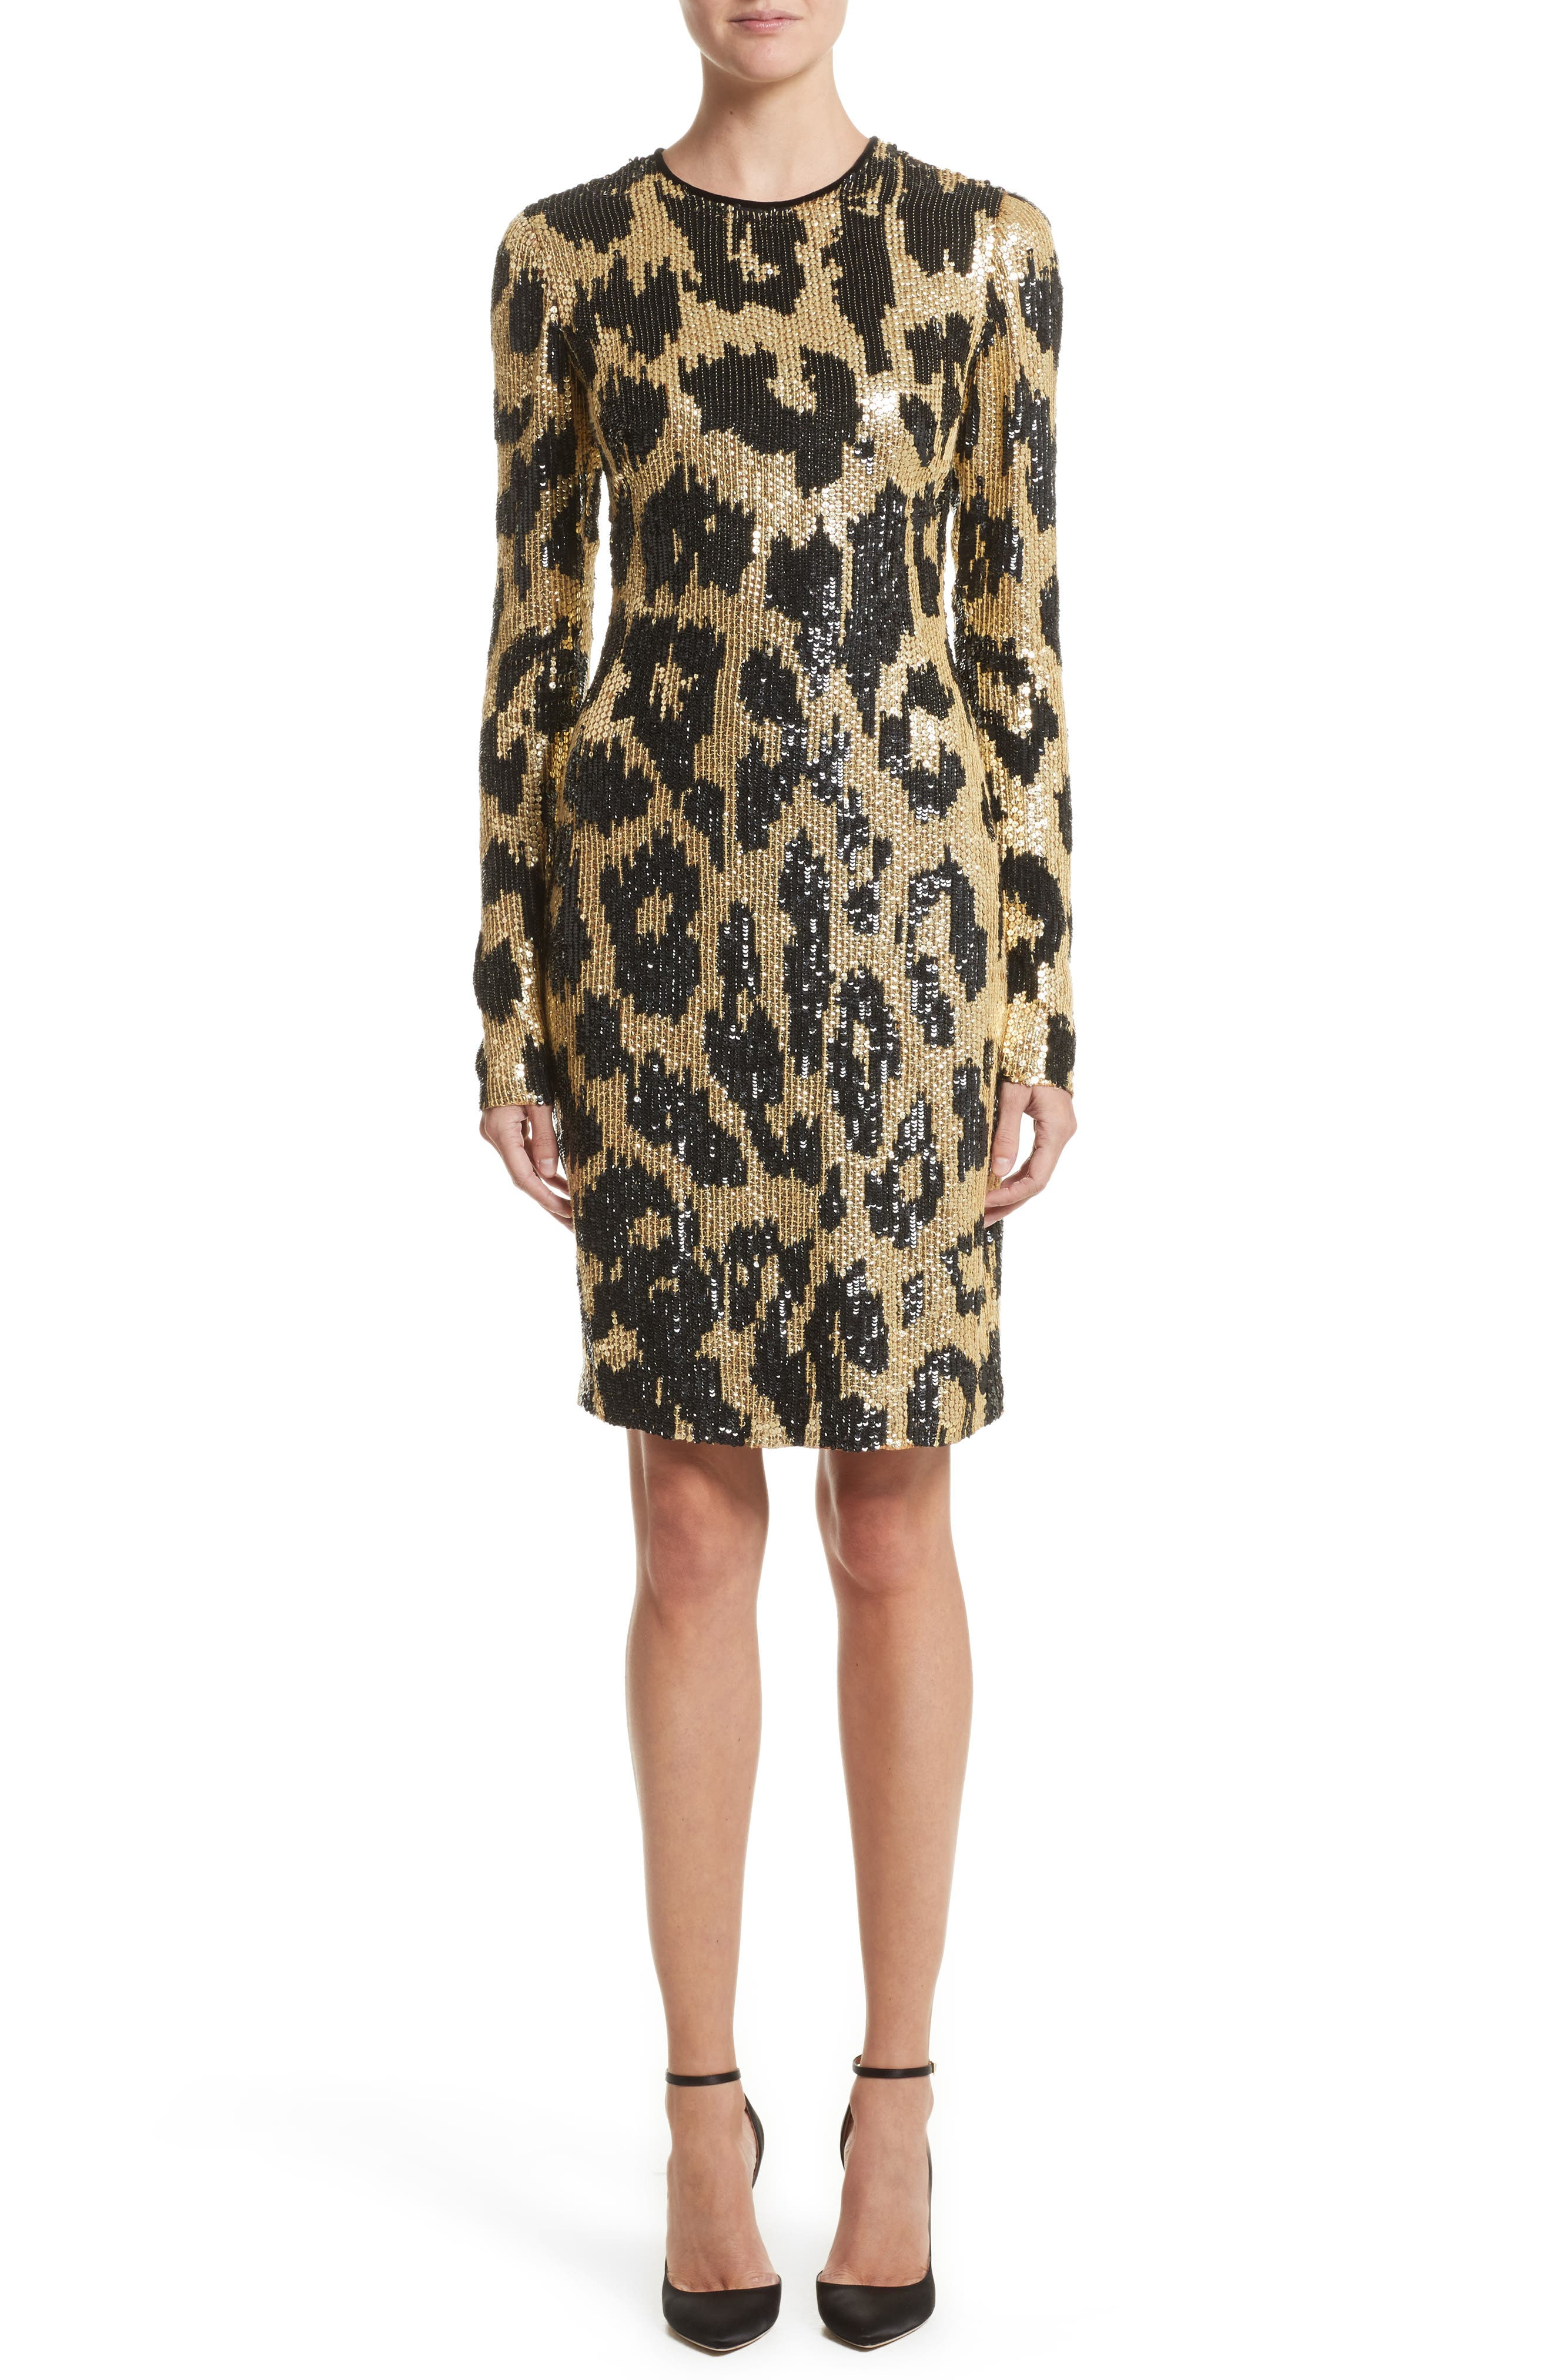 Alternate Image 1 Selected - Naeem Khan Cheetah Print Sequin Sheath Dress